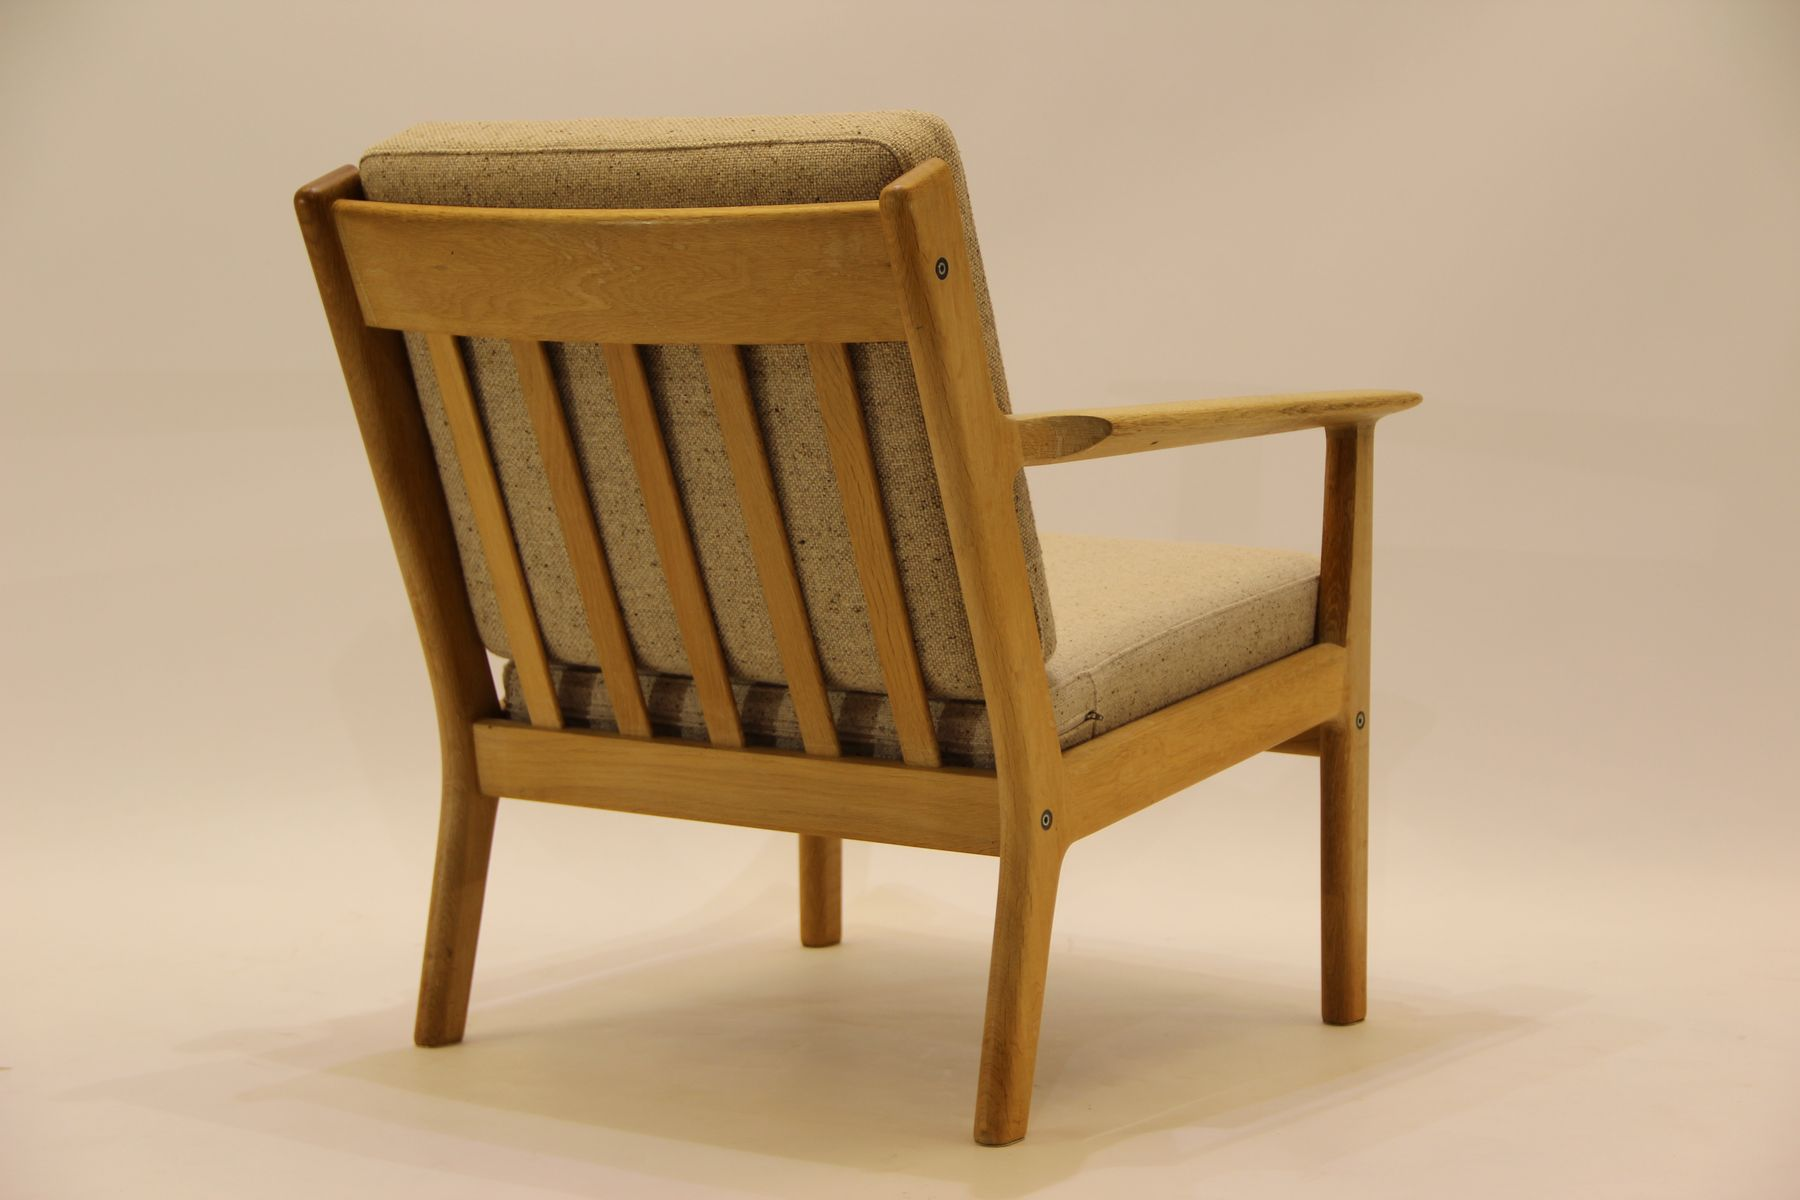 fauteuil ge 265 vintage par hans j wegner pour getama en. Black Bedroom Furniture Sets. Home Design Ideas